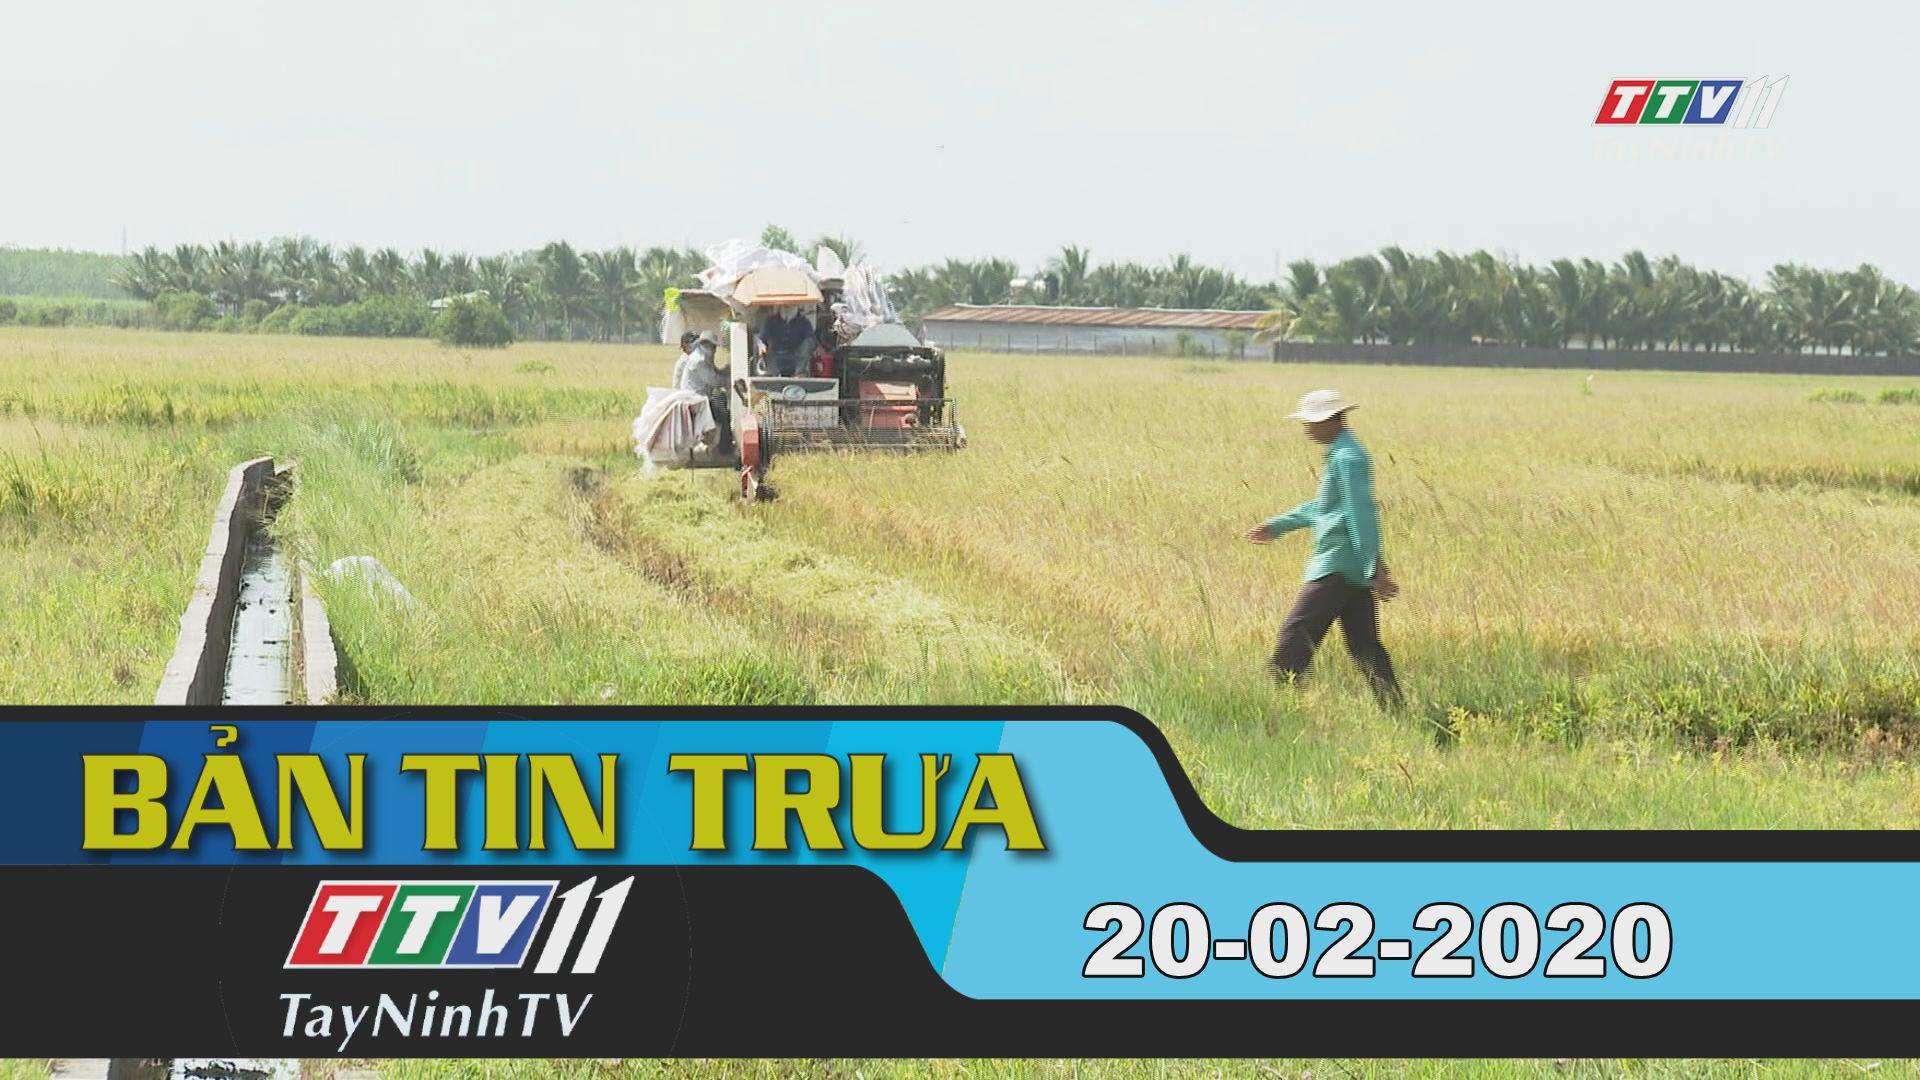 Bản tin trưa 20-02-2020 | Tin tức hôm nay | TayNinhTV